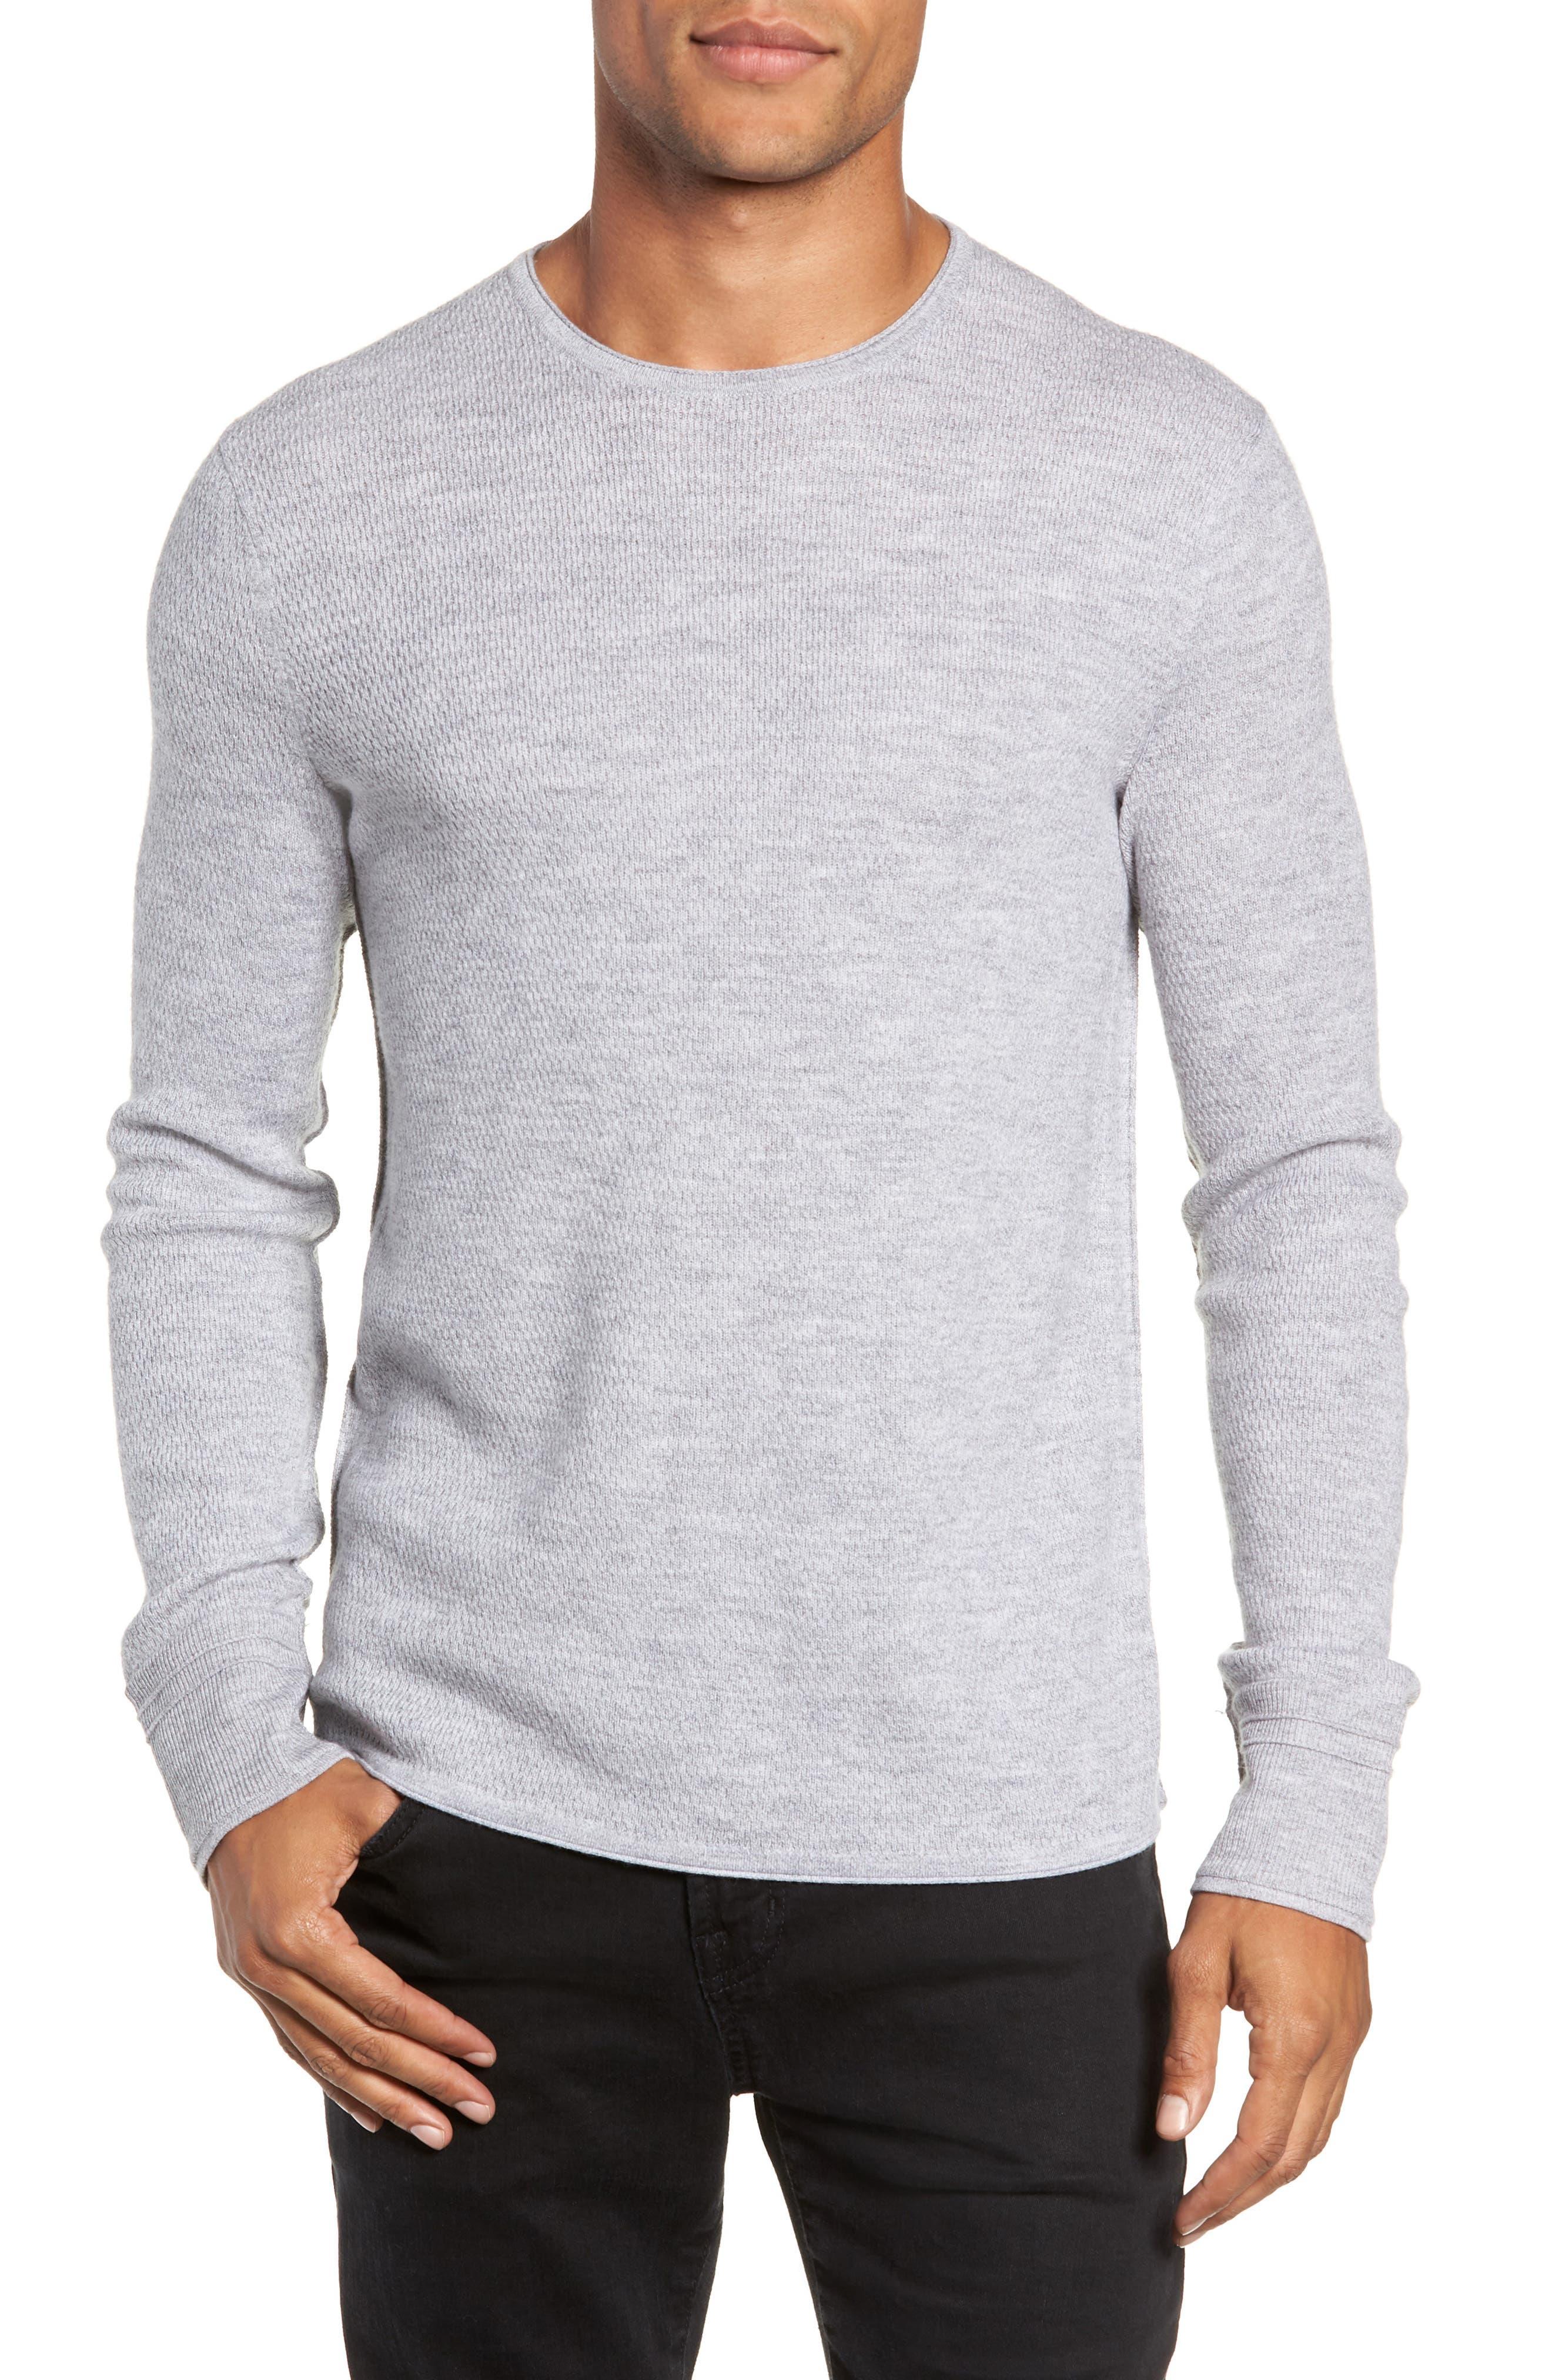 Rag & Bone Gregory Merino Wool Blend Crewneck Sweater, Grey